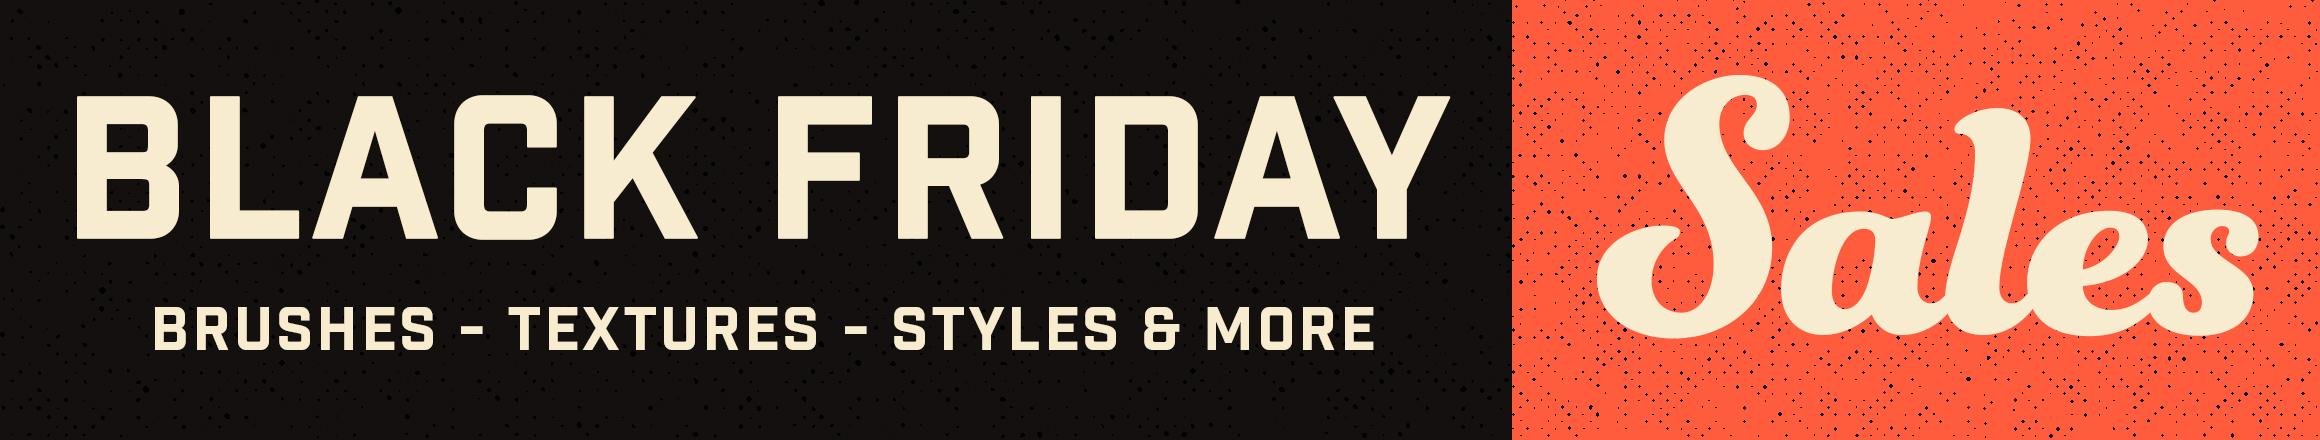 Black Friday by Guerillacraft